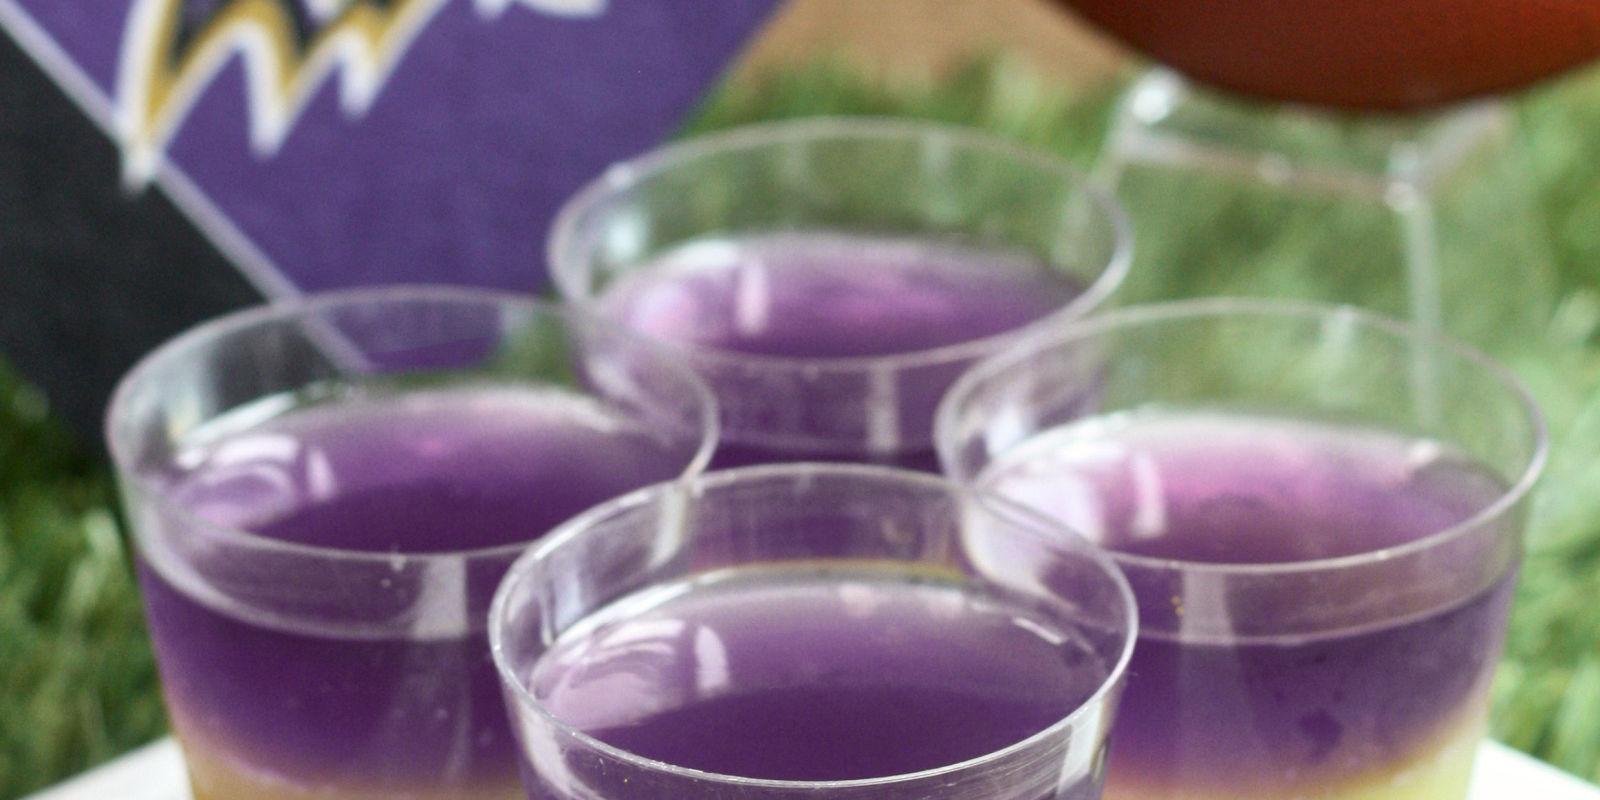 purple colored shots